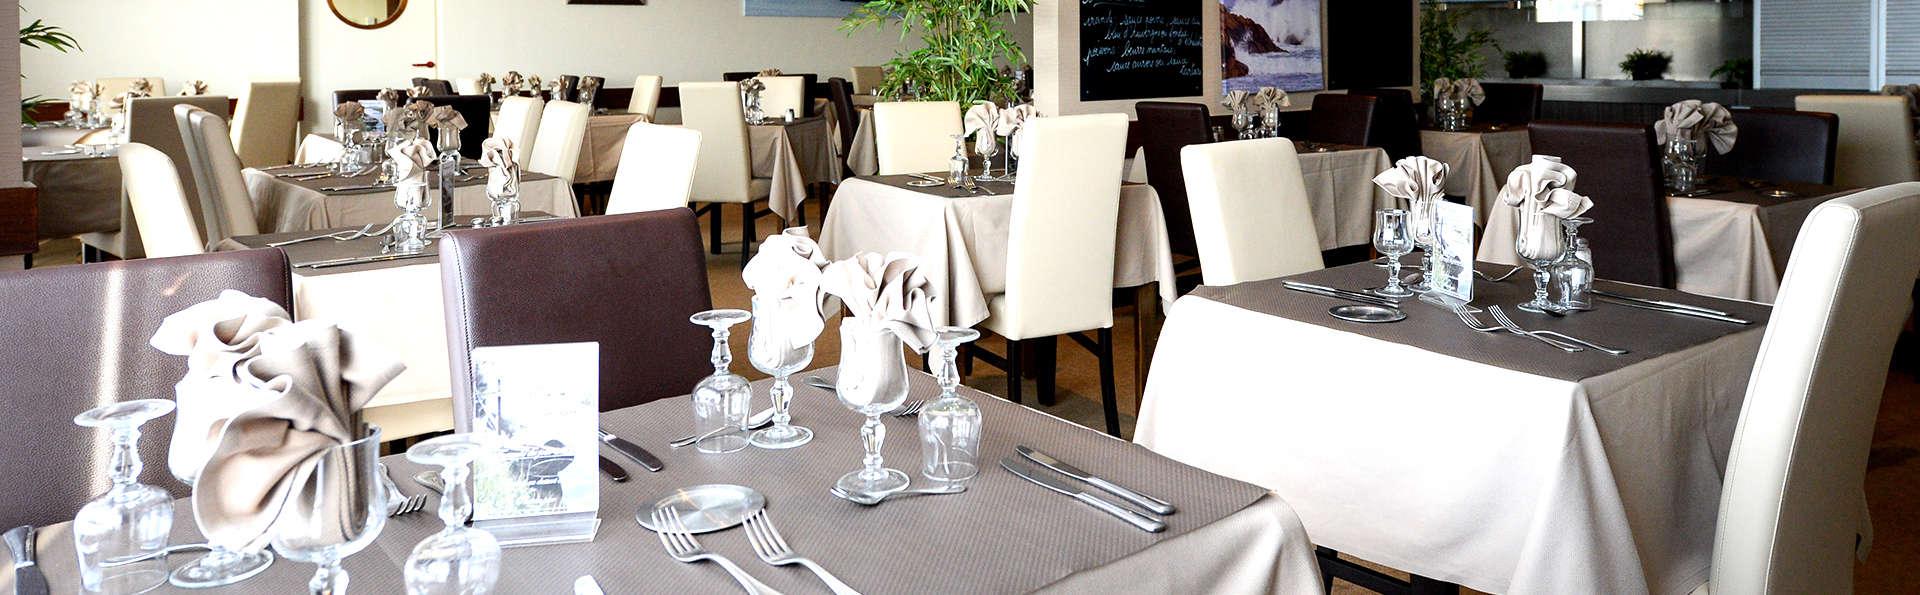 Week-end avec dîner au coeur du Cotentin